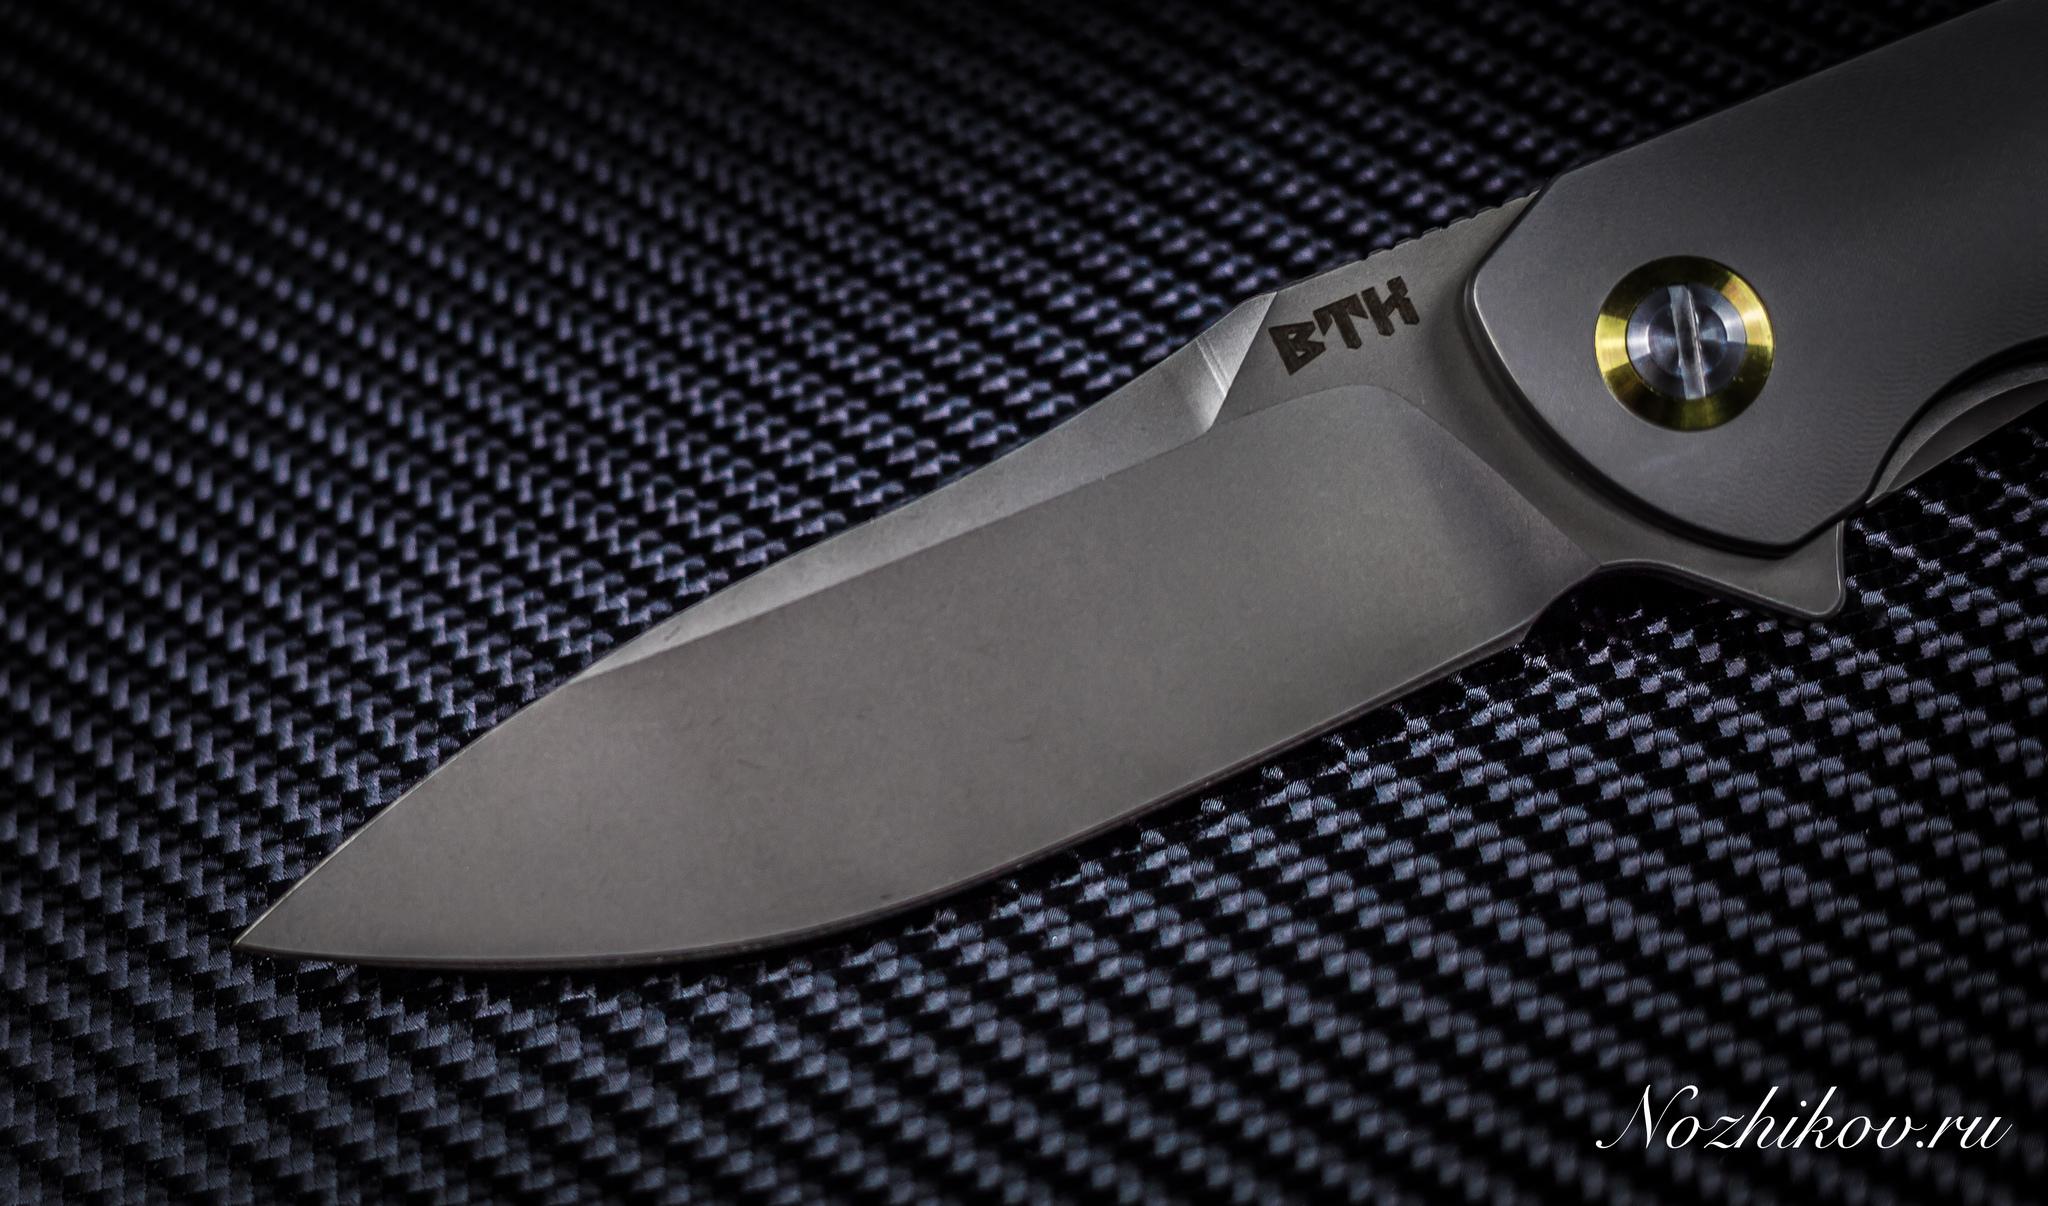 Складной нож Bestech Knives BT1703A, сталь CPM-S35VN, рукоять титан